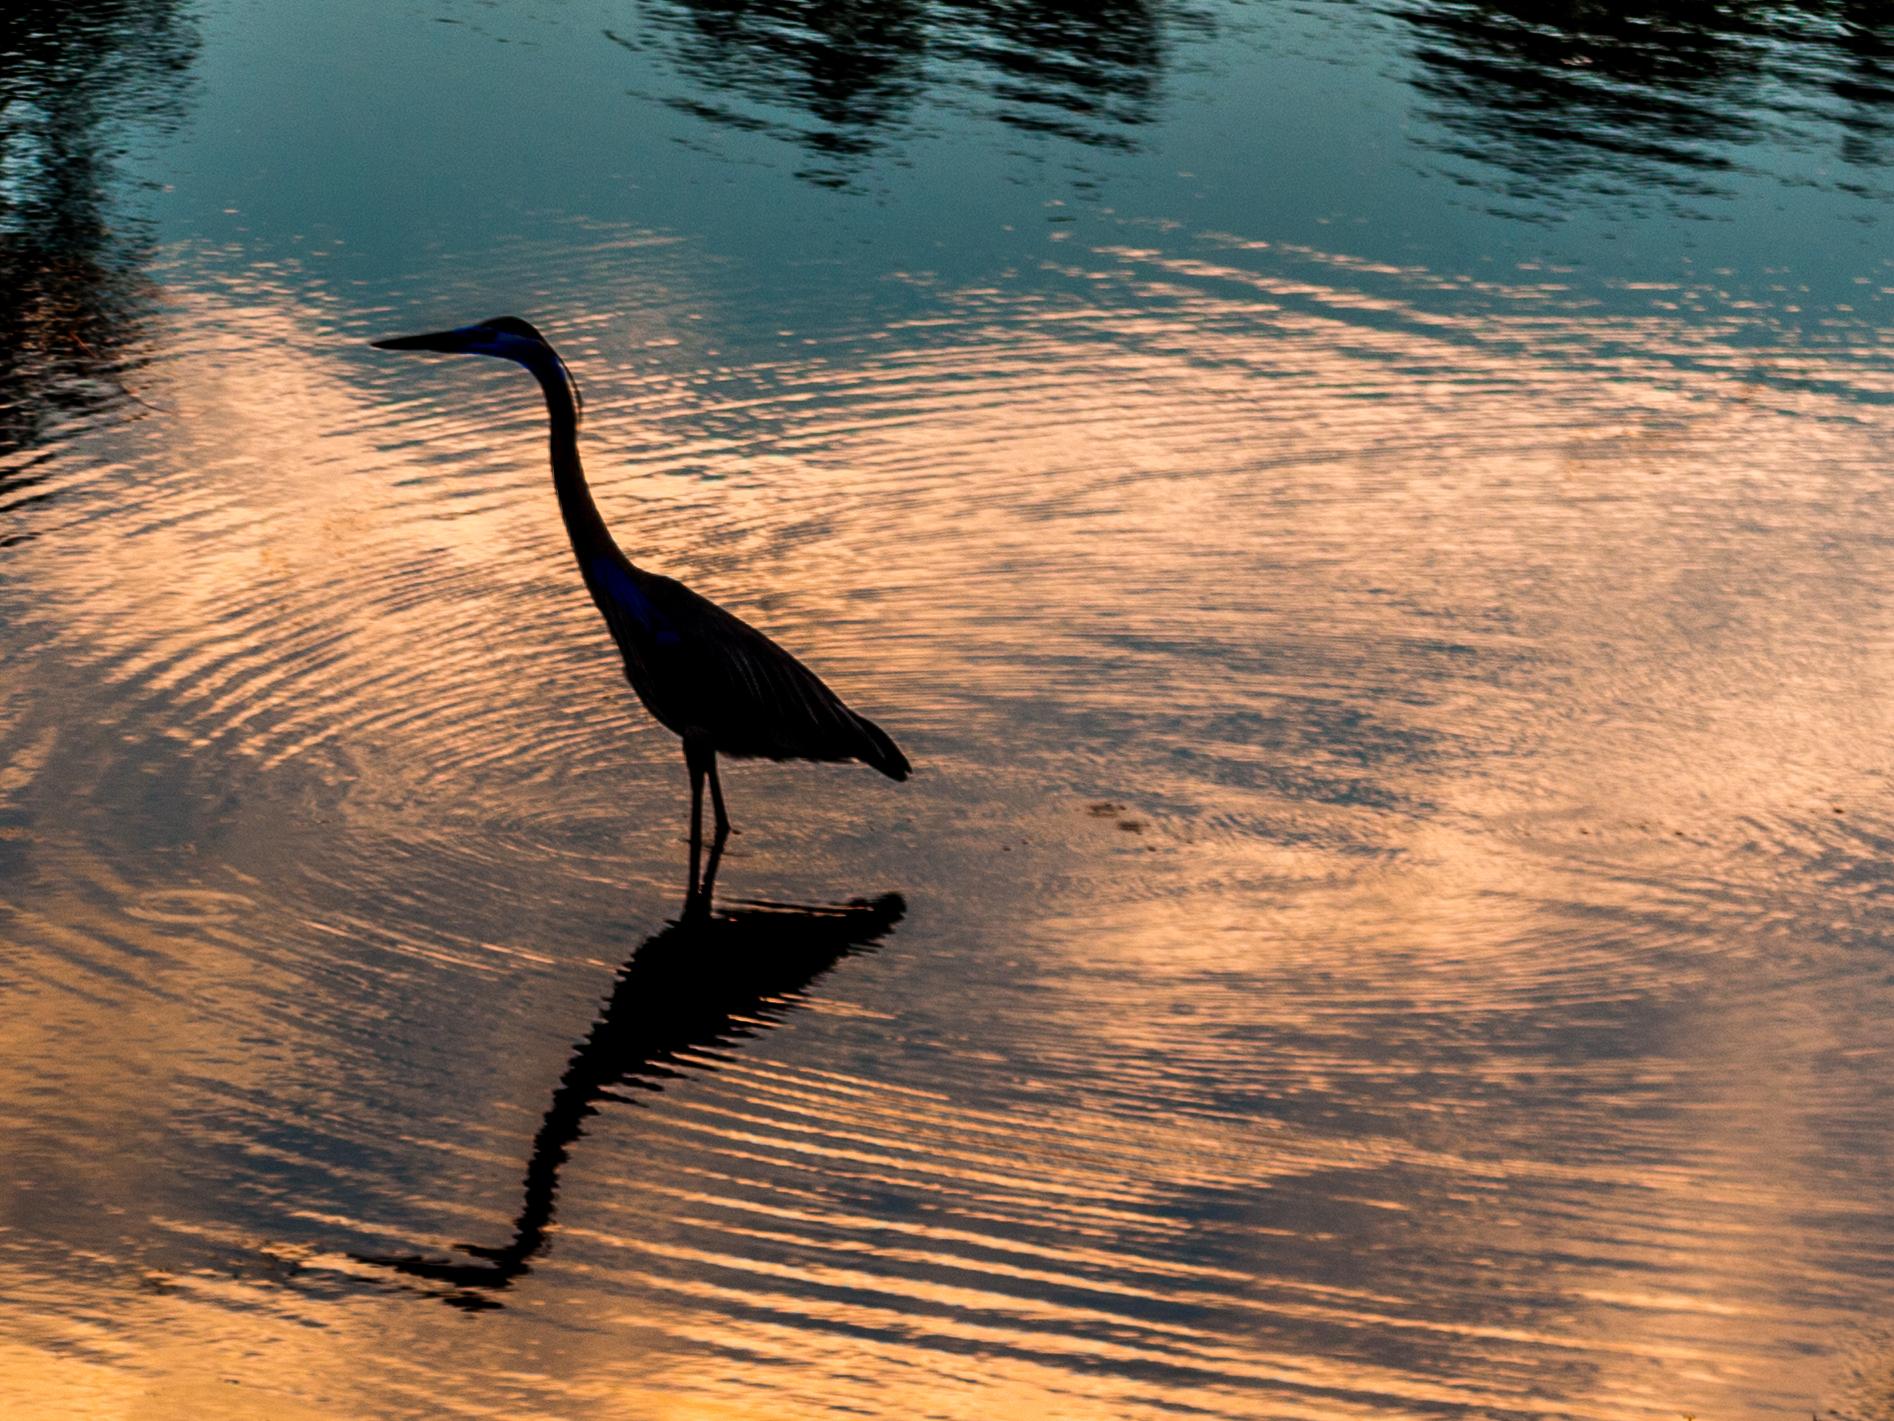 Wallpaper : birds, animals, sunset, sea, lake, reflection